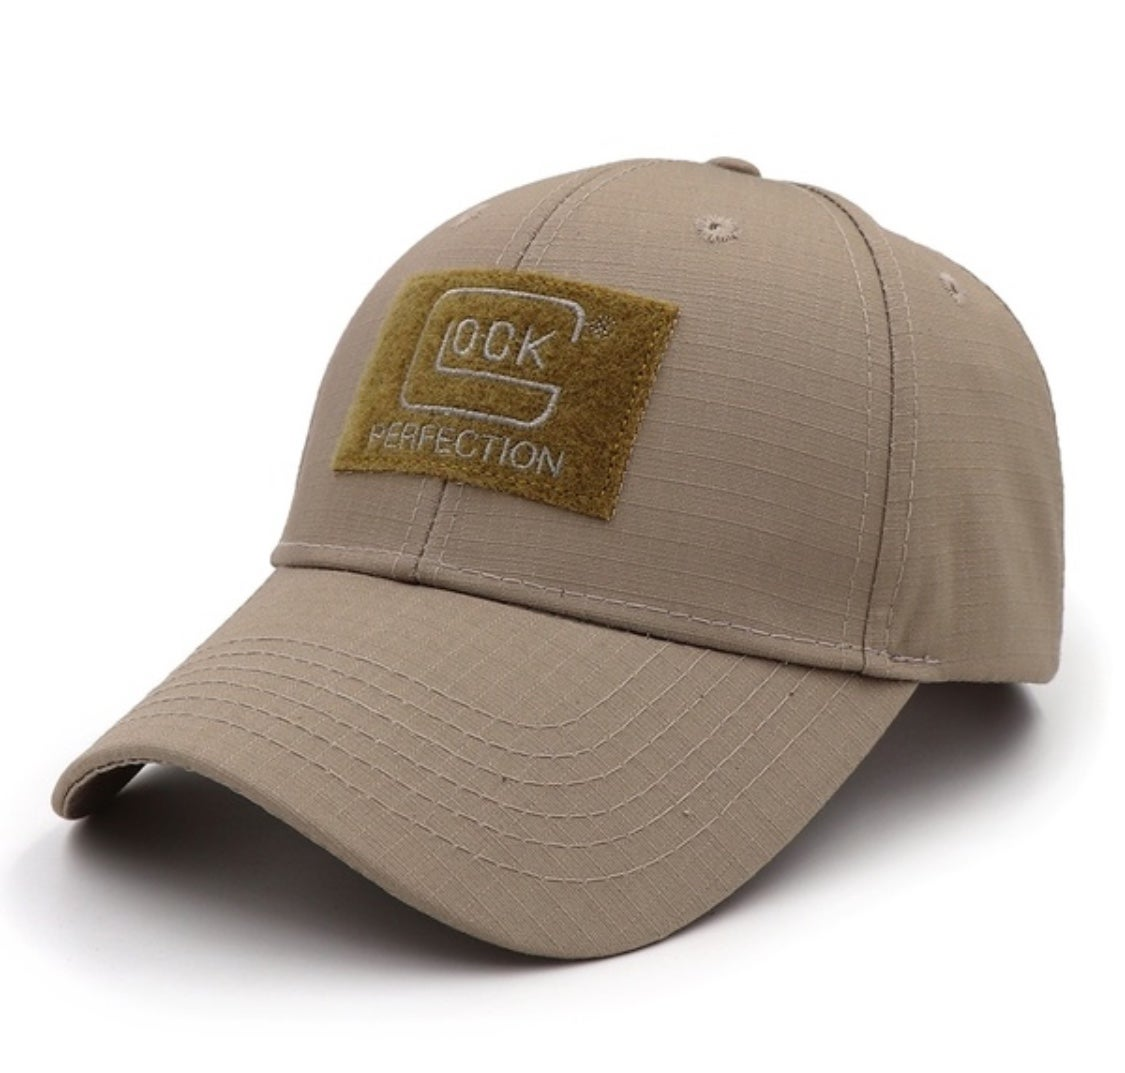 Image of GLOCK Baseball Cap